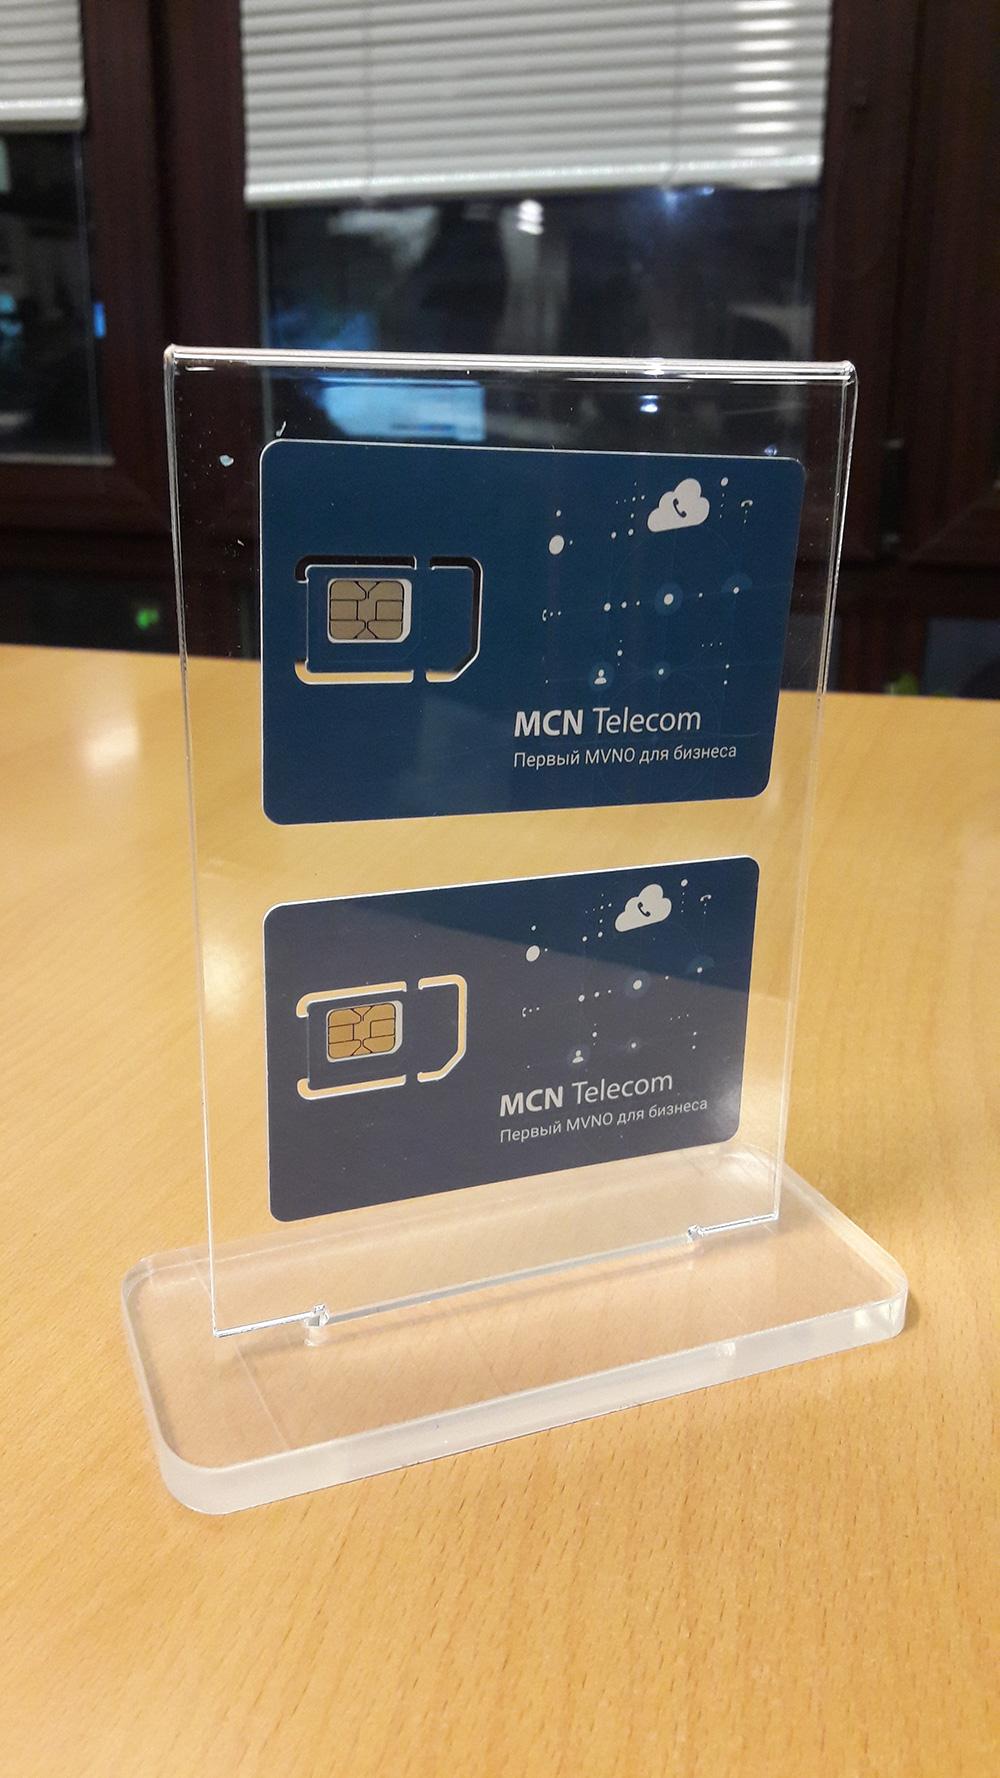 SIM-карта MCN Telecom